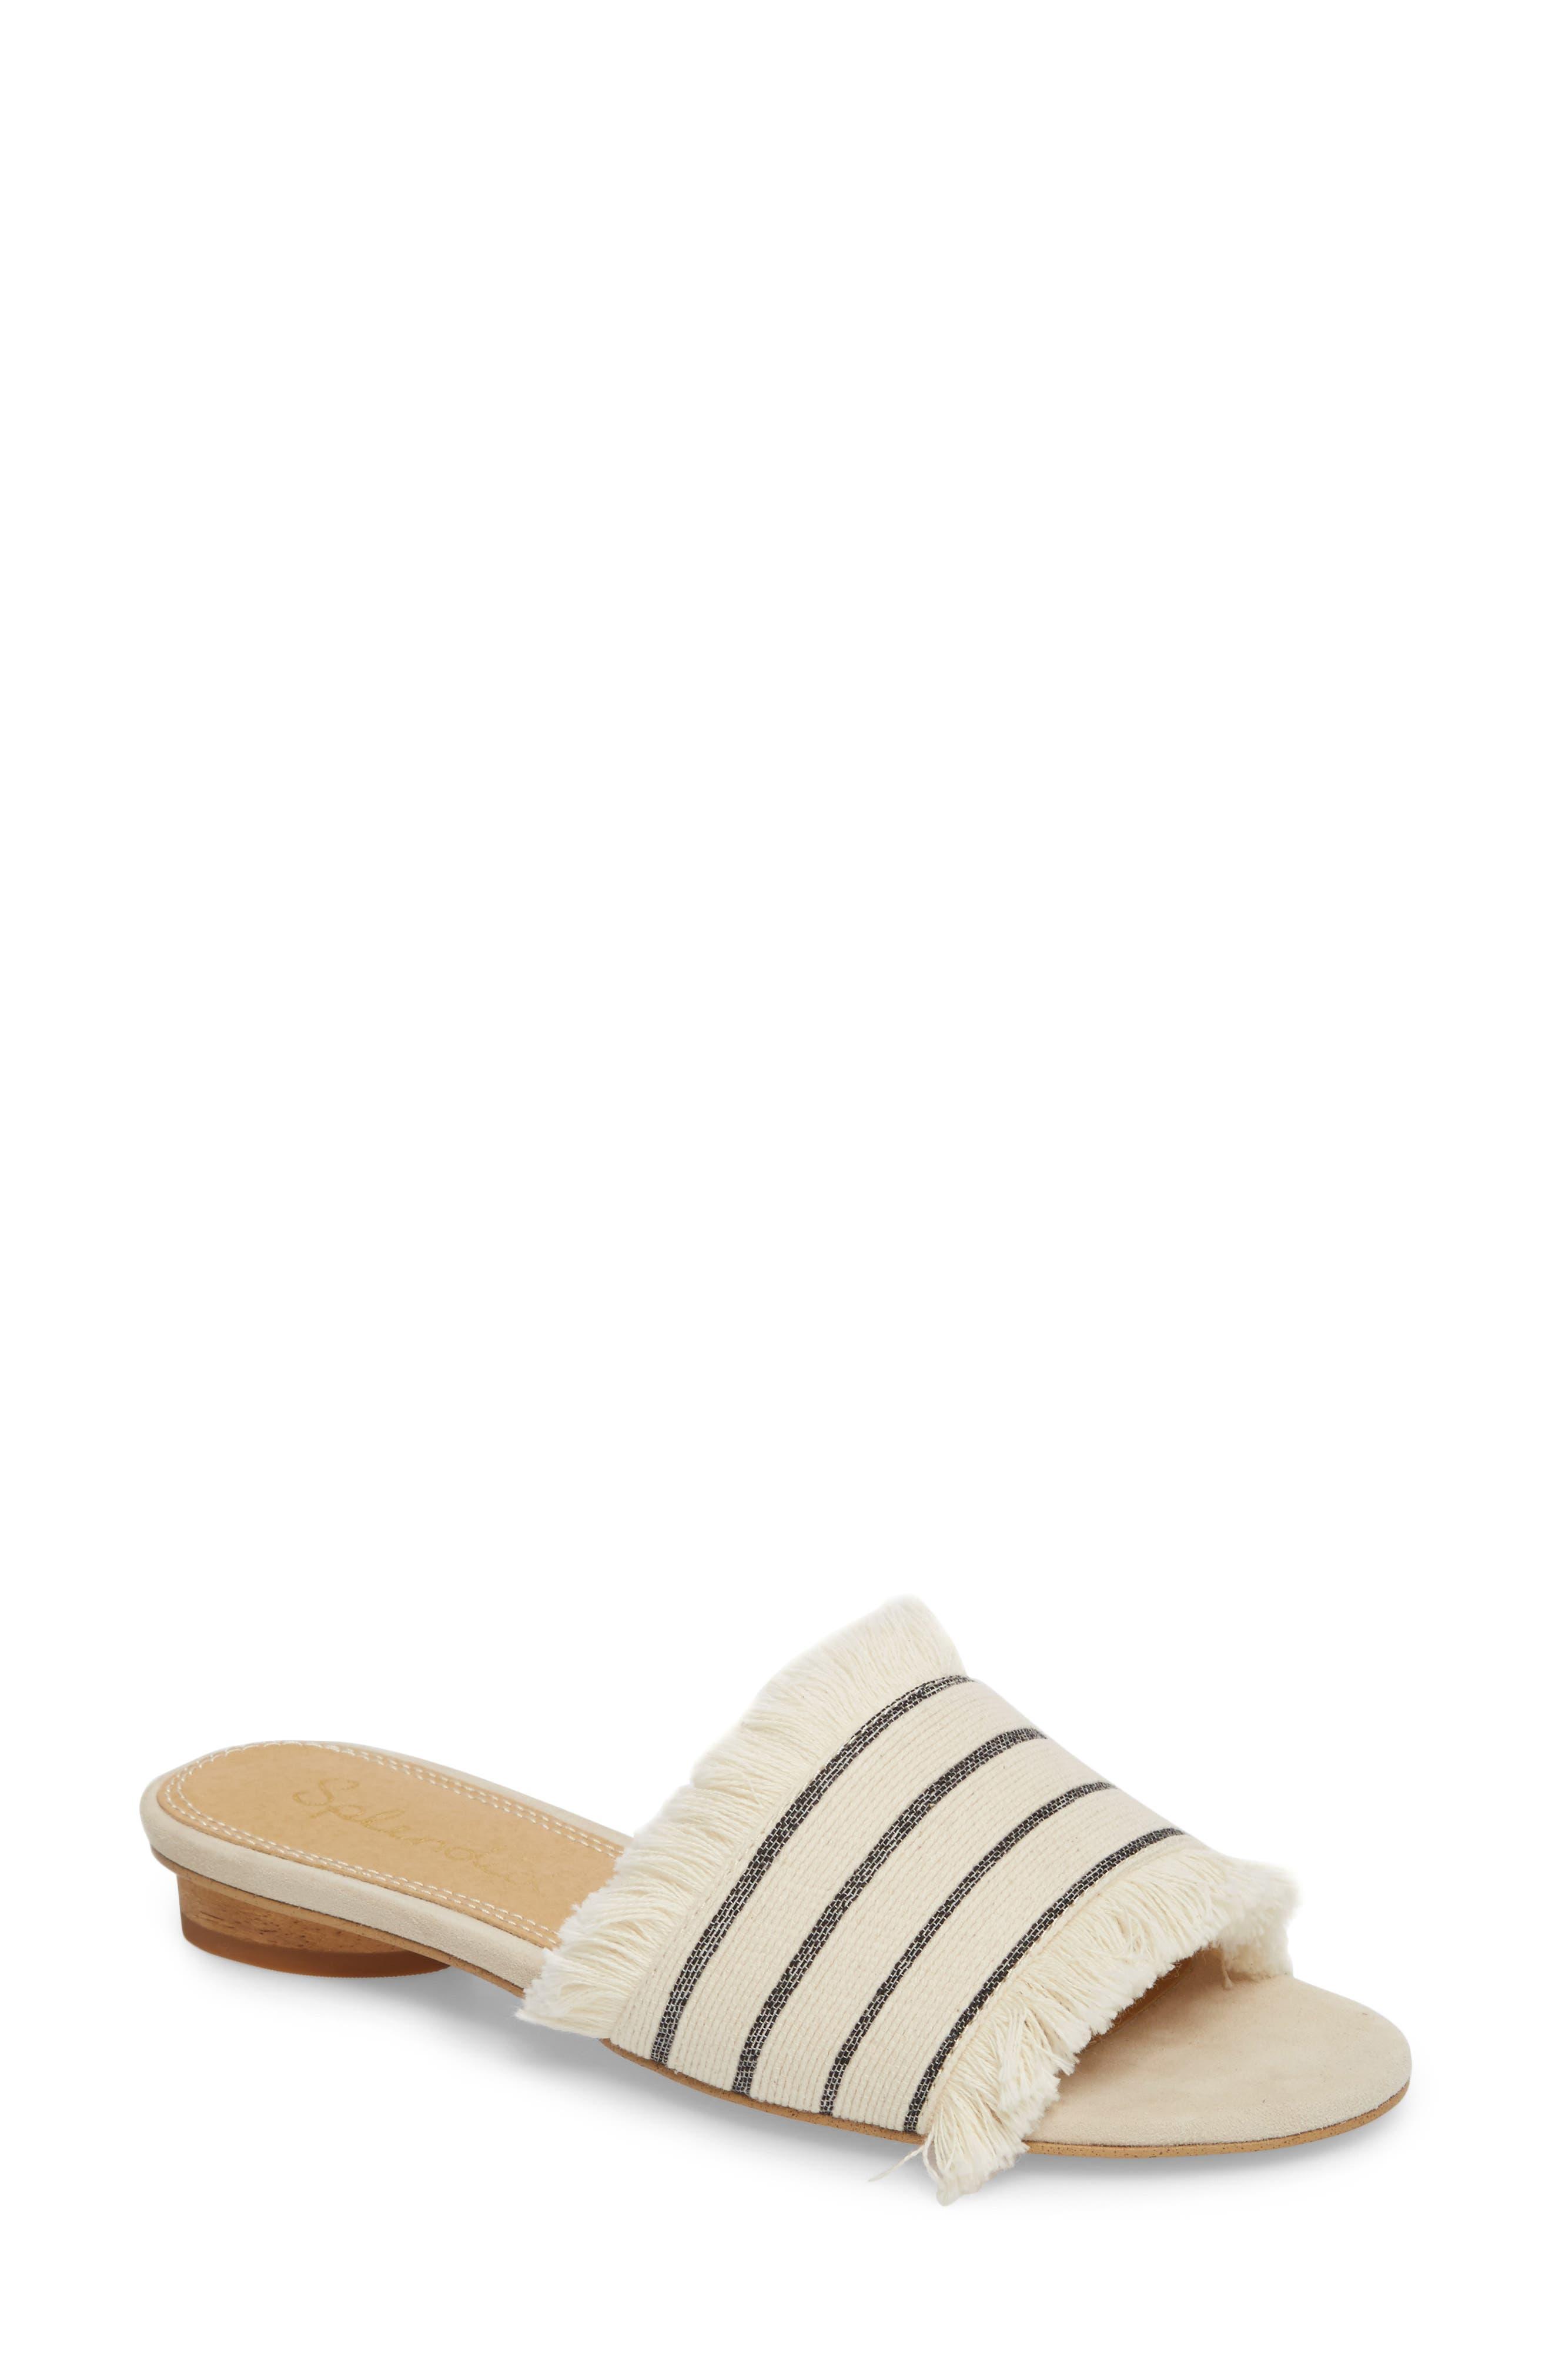 Baldwyn Fringe Slide Sandal,                         Main,                         color, Cream Leather